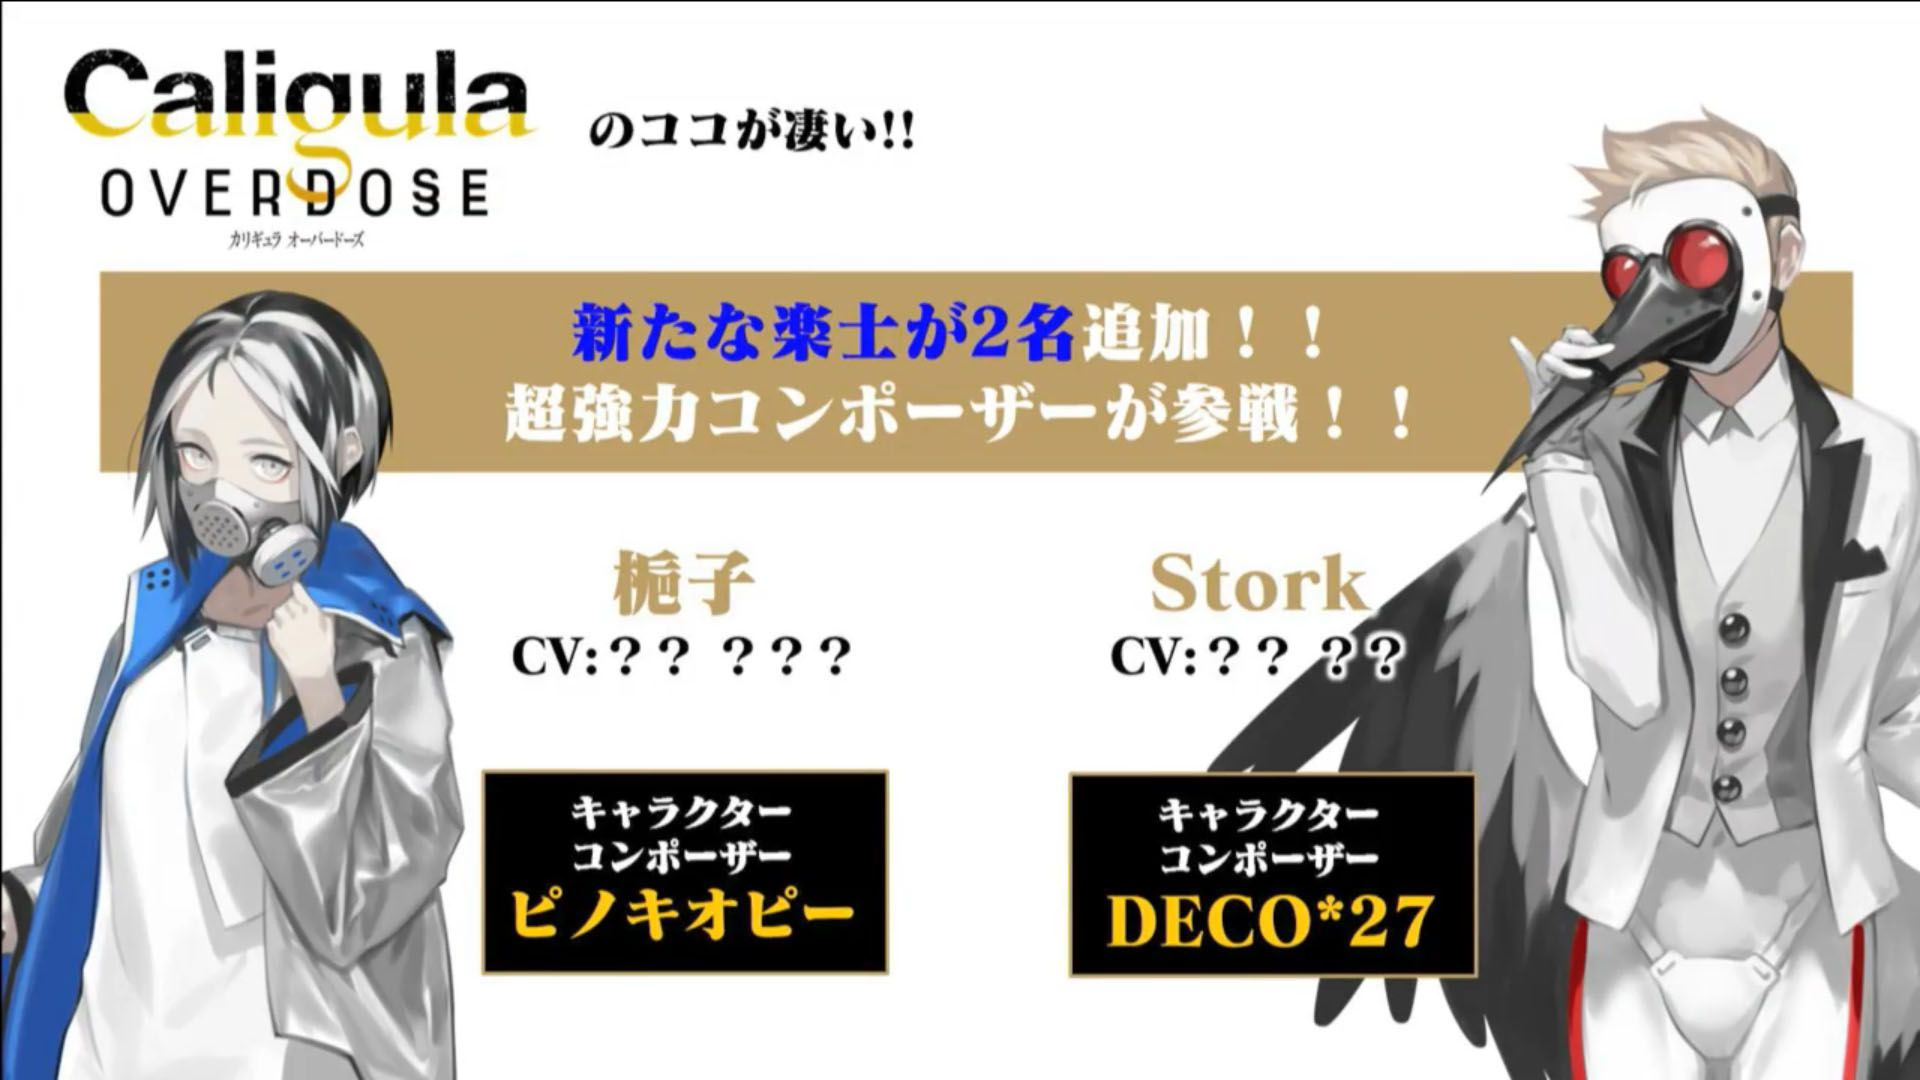 Caligula-Overdose-PS4-Ann_Slides_11-17-17_005